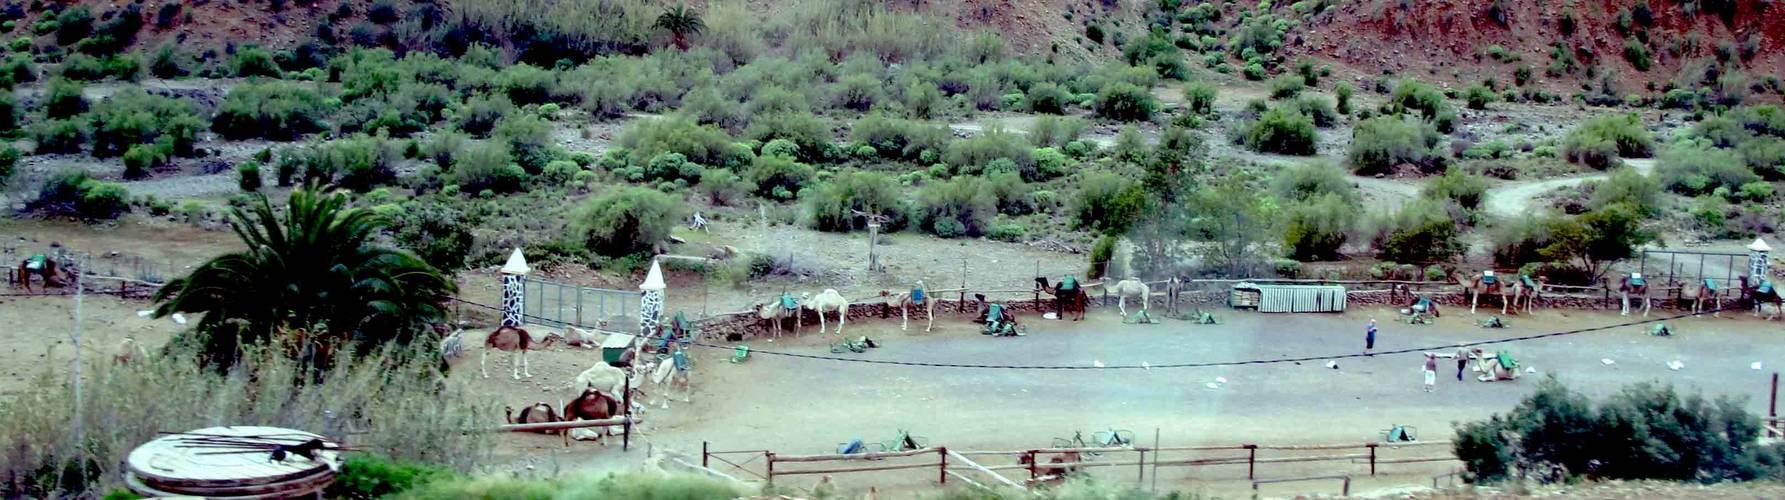 Kamele auf Gran Canaria.